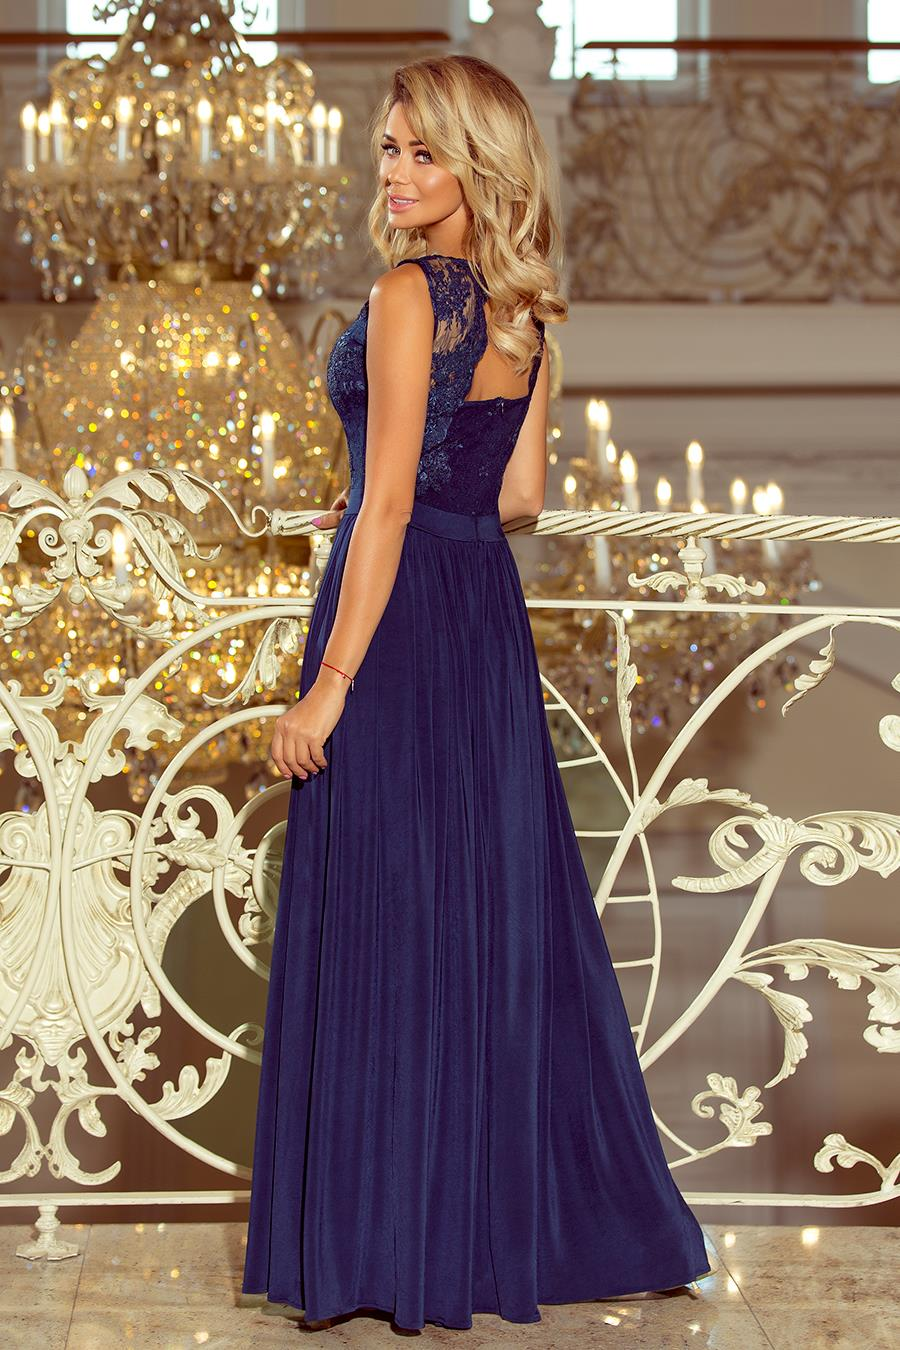 267e97e2e9 Długa Sukienka z Koronkową Górą Granatowa NU215-2 BESIMA.pl